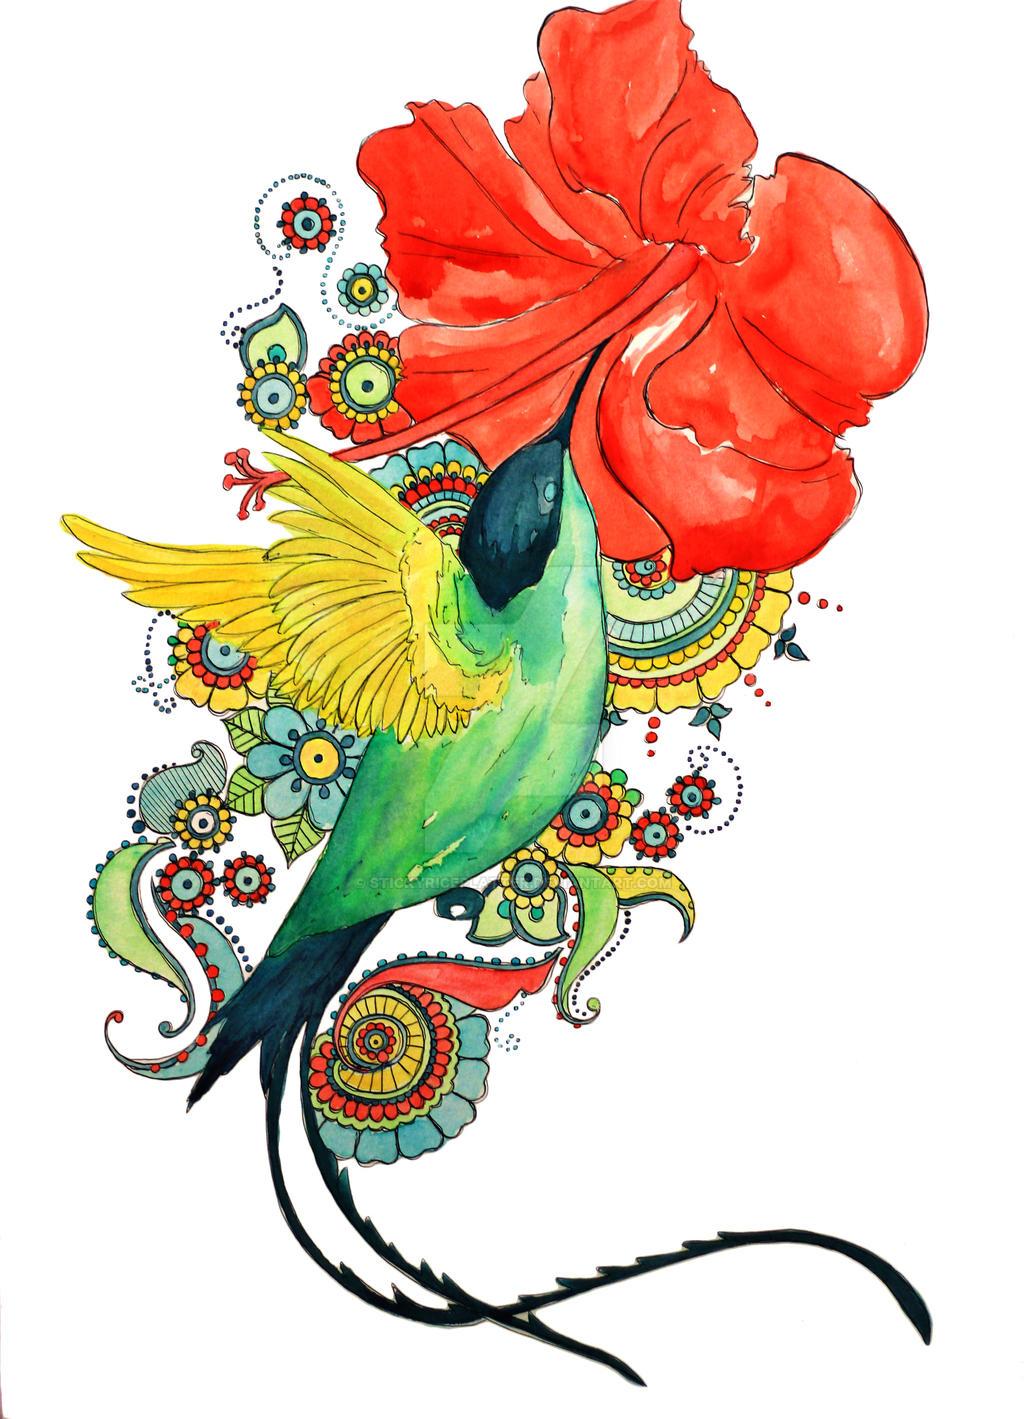 hummingbird print version by stickyriceplatter hummingbird print version by stickyriceplatter